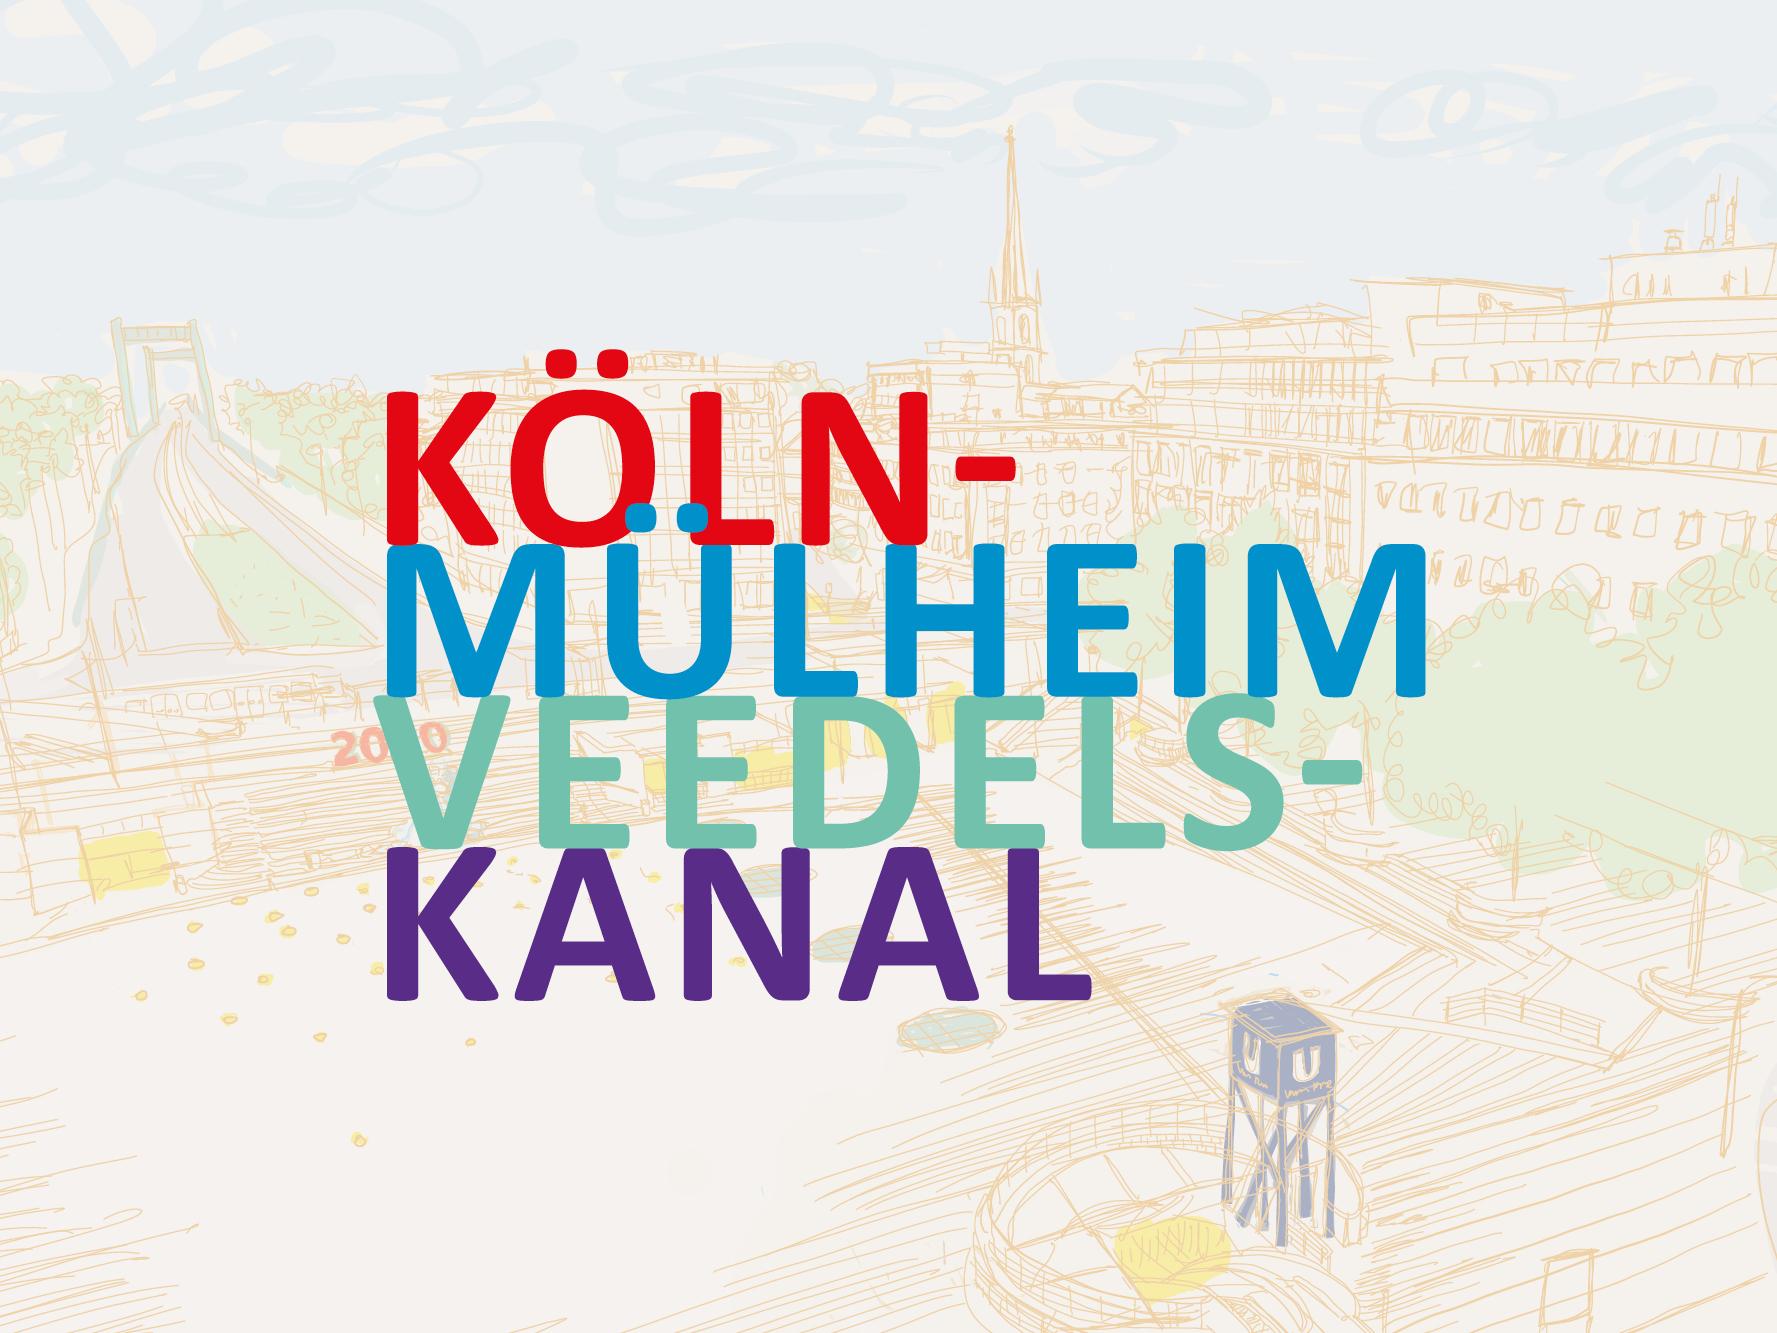 Veedels-Kanal für Köln-Mülheim